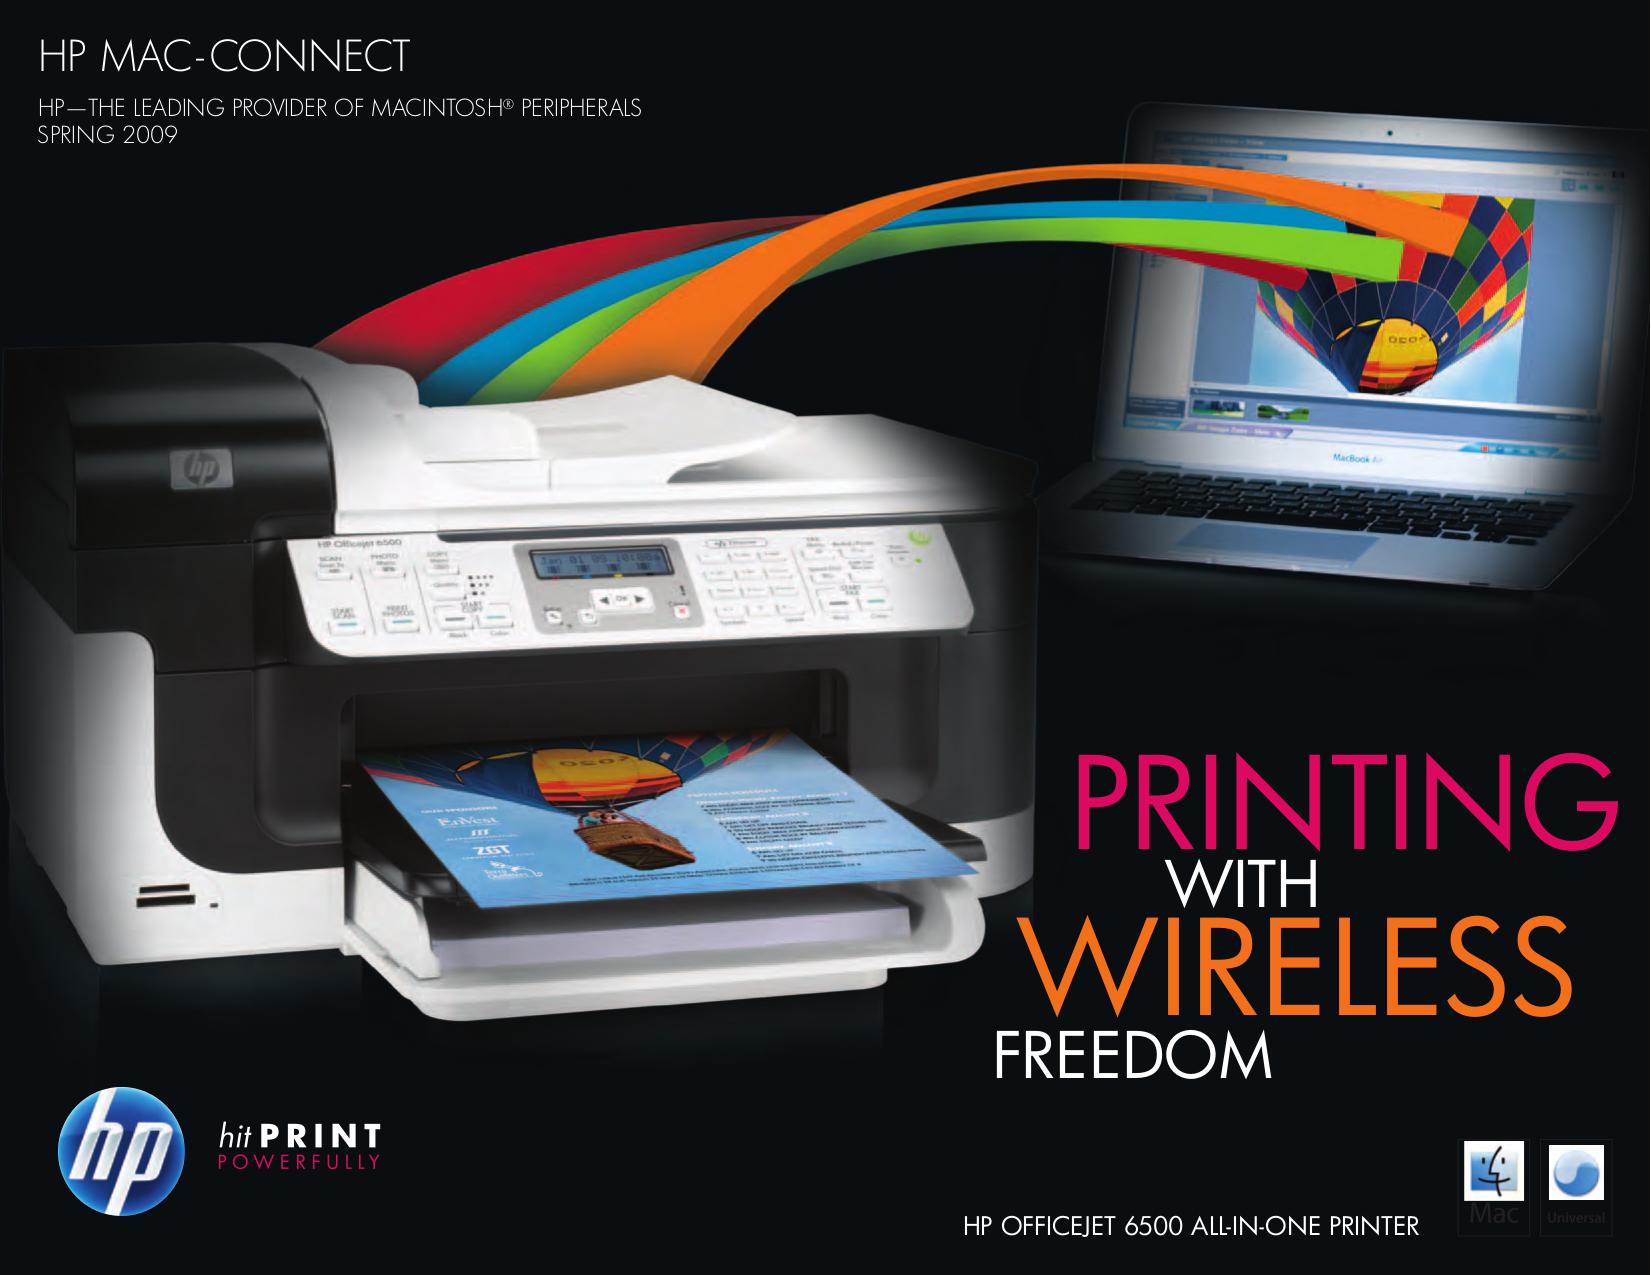 pdf for HP Multifunction Printer Officejet 4315v manual